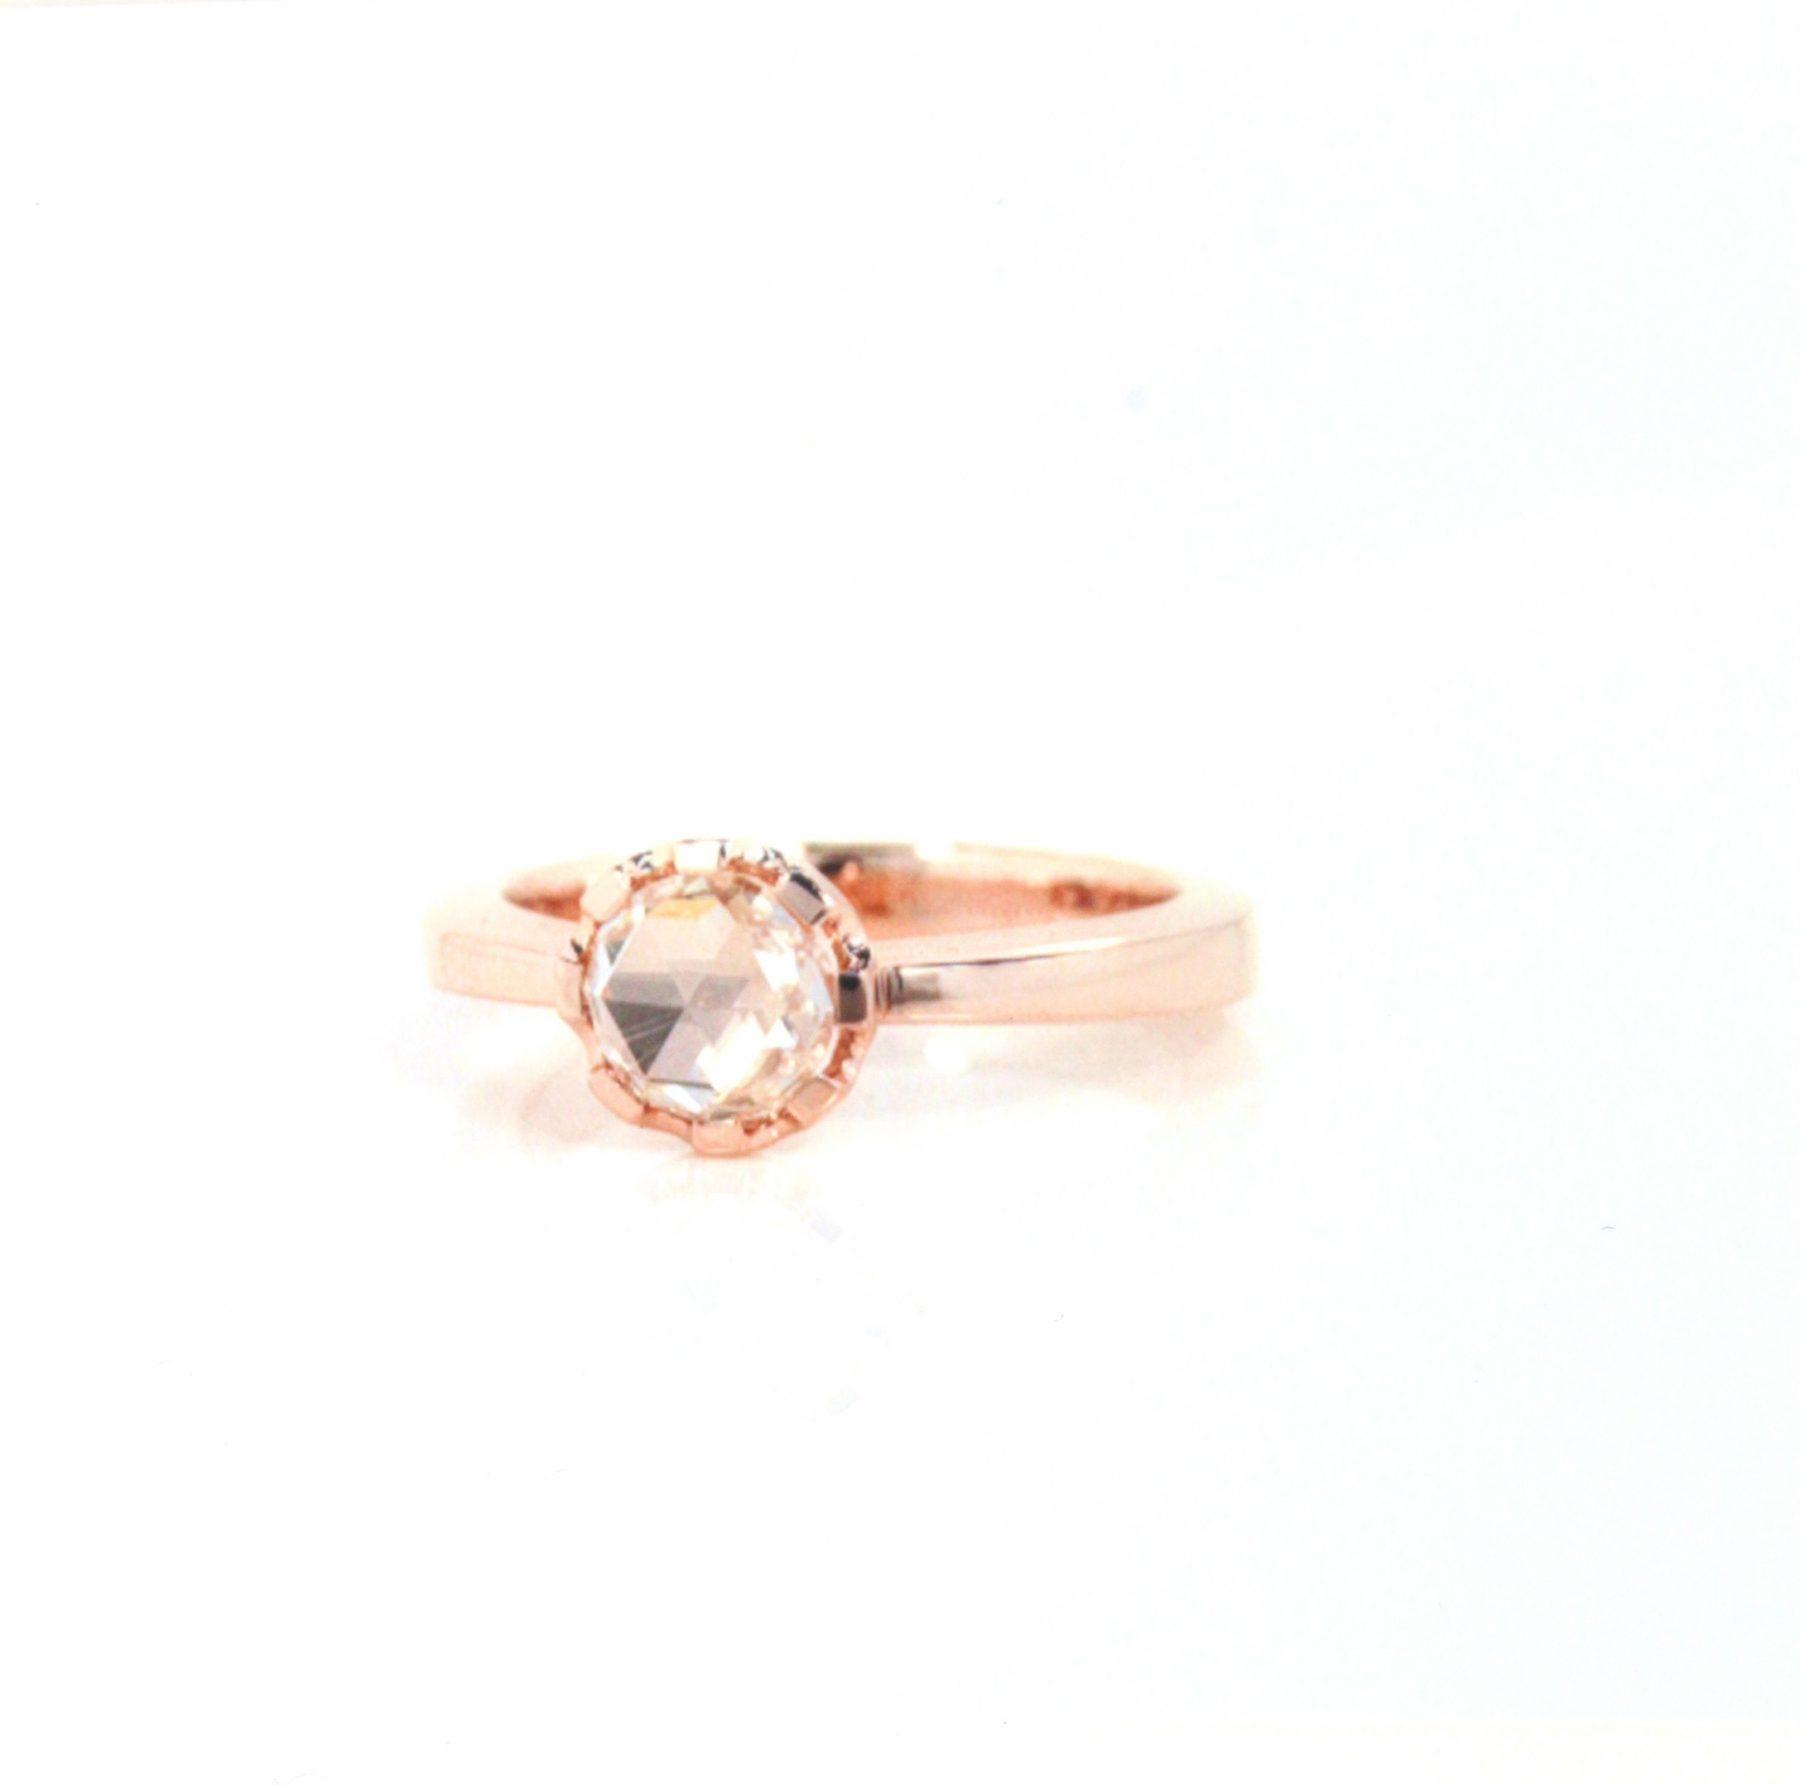 Ring Diamant Rose Roségold - Jochen Pohl - C6-6VIIIR